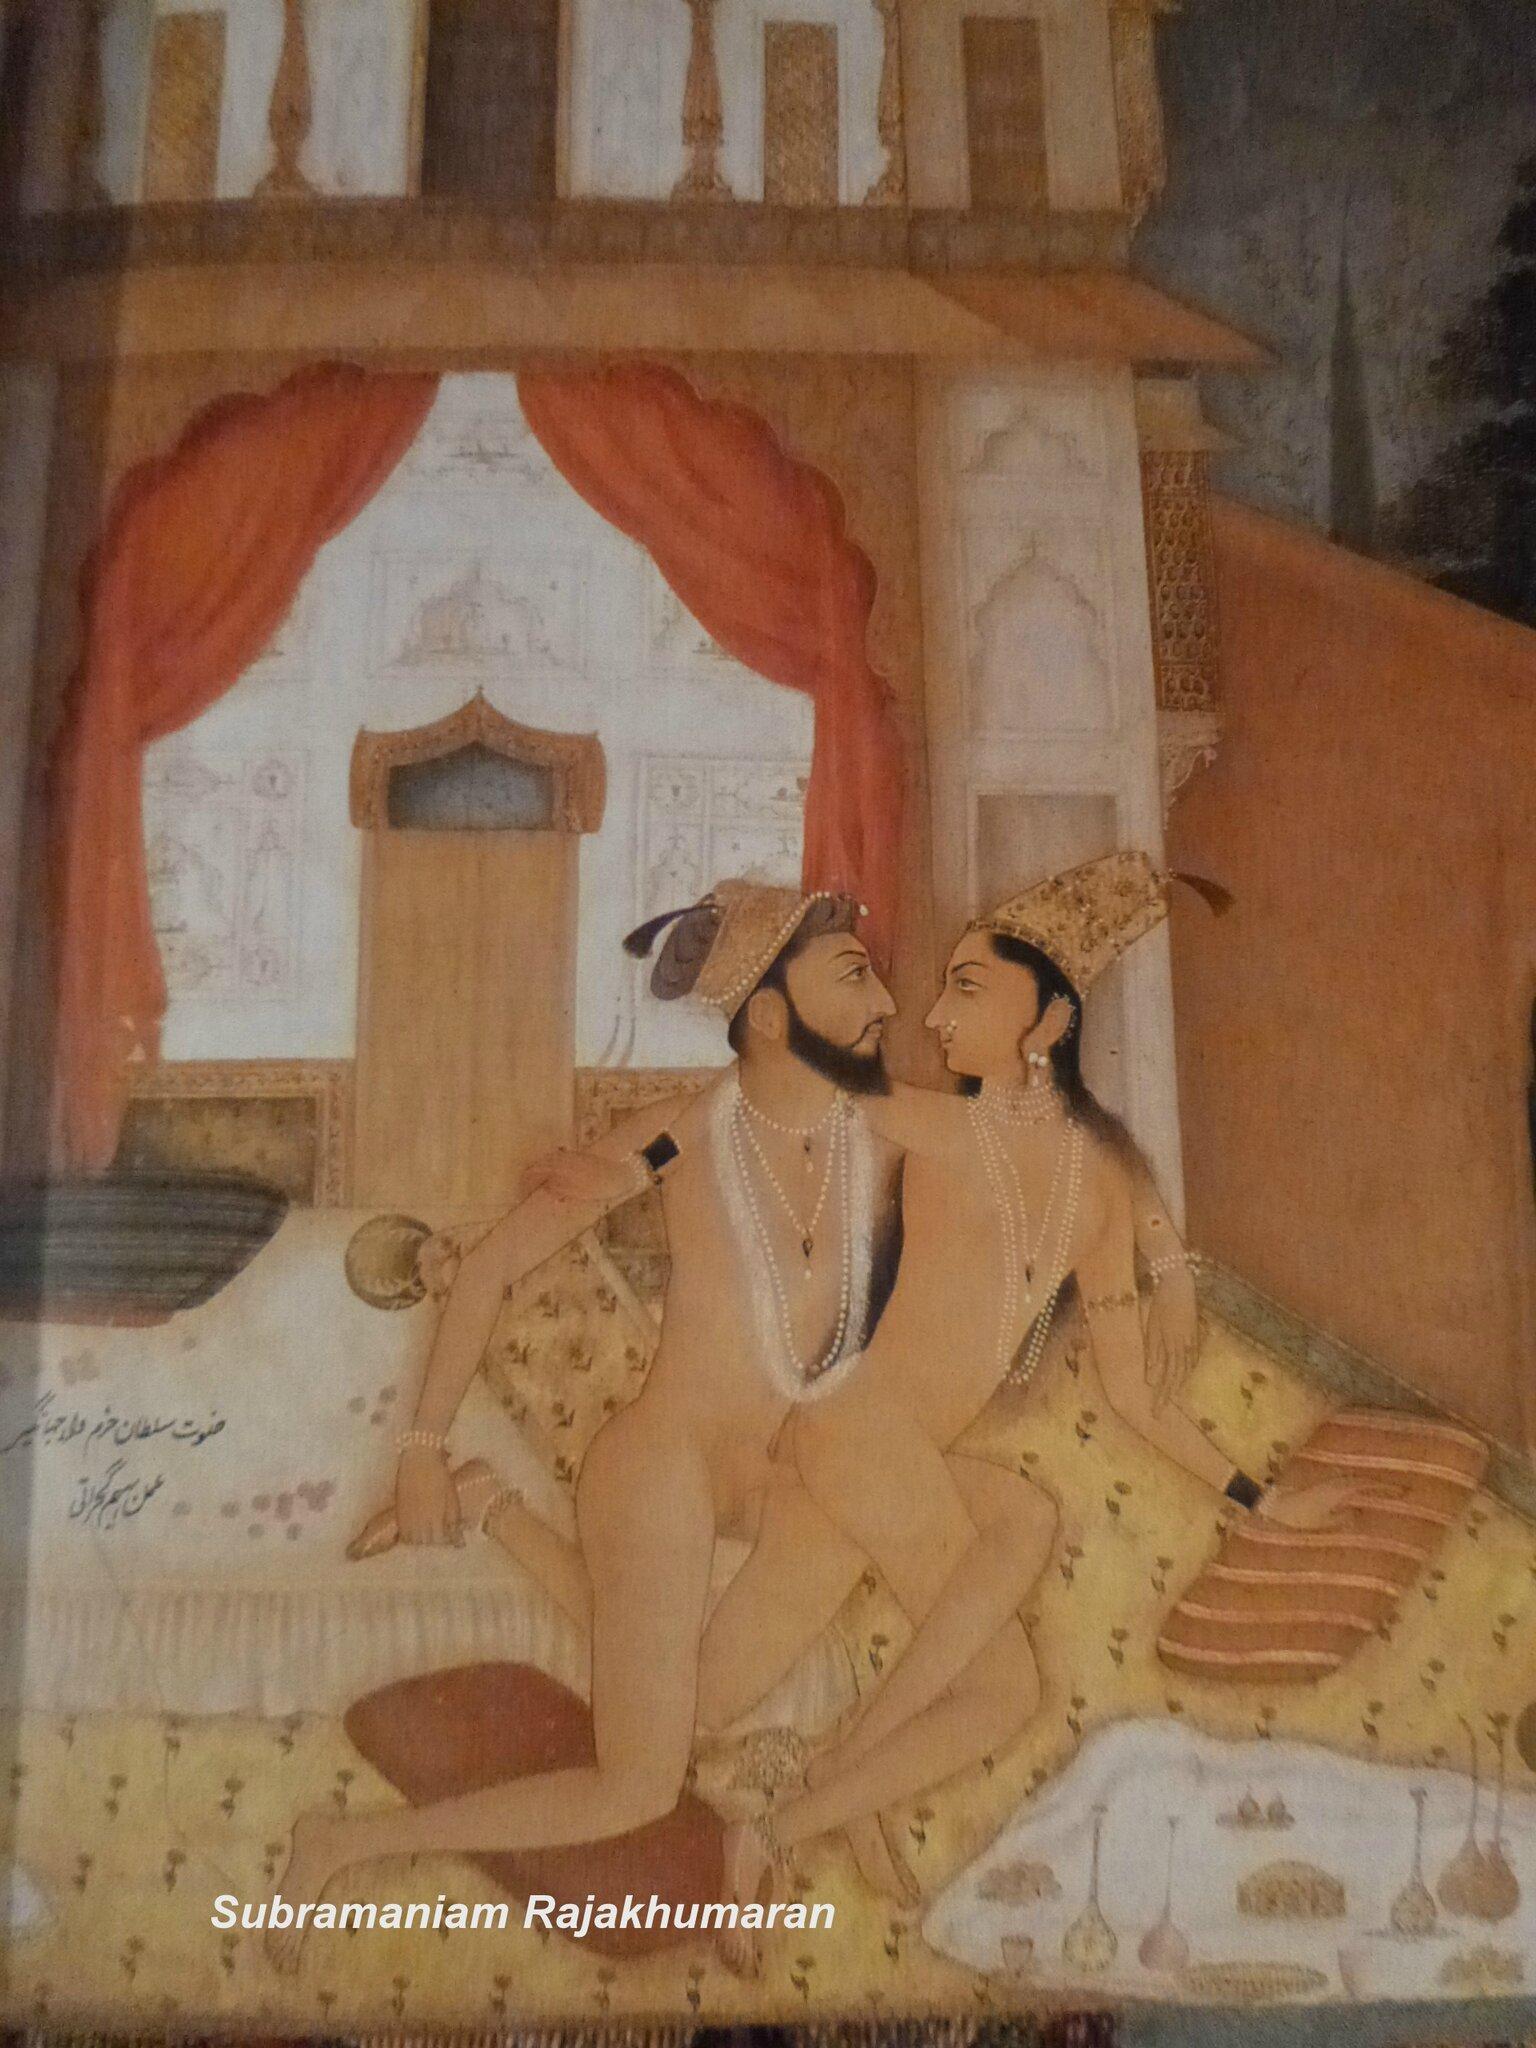 L'Auparishtaka ou la relation buccale